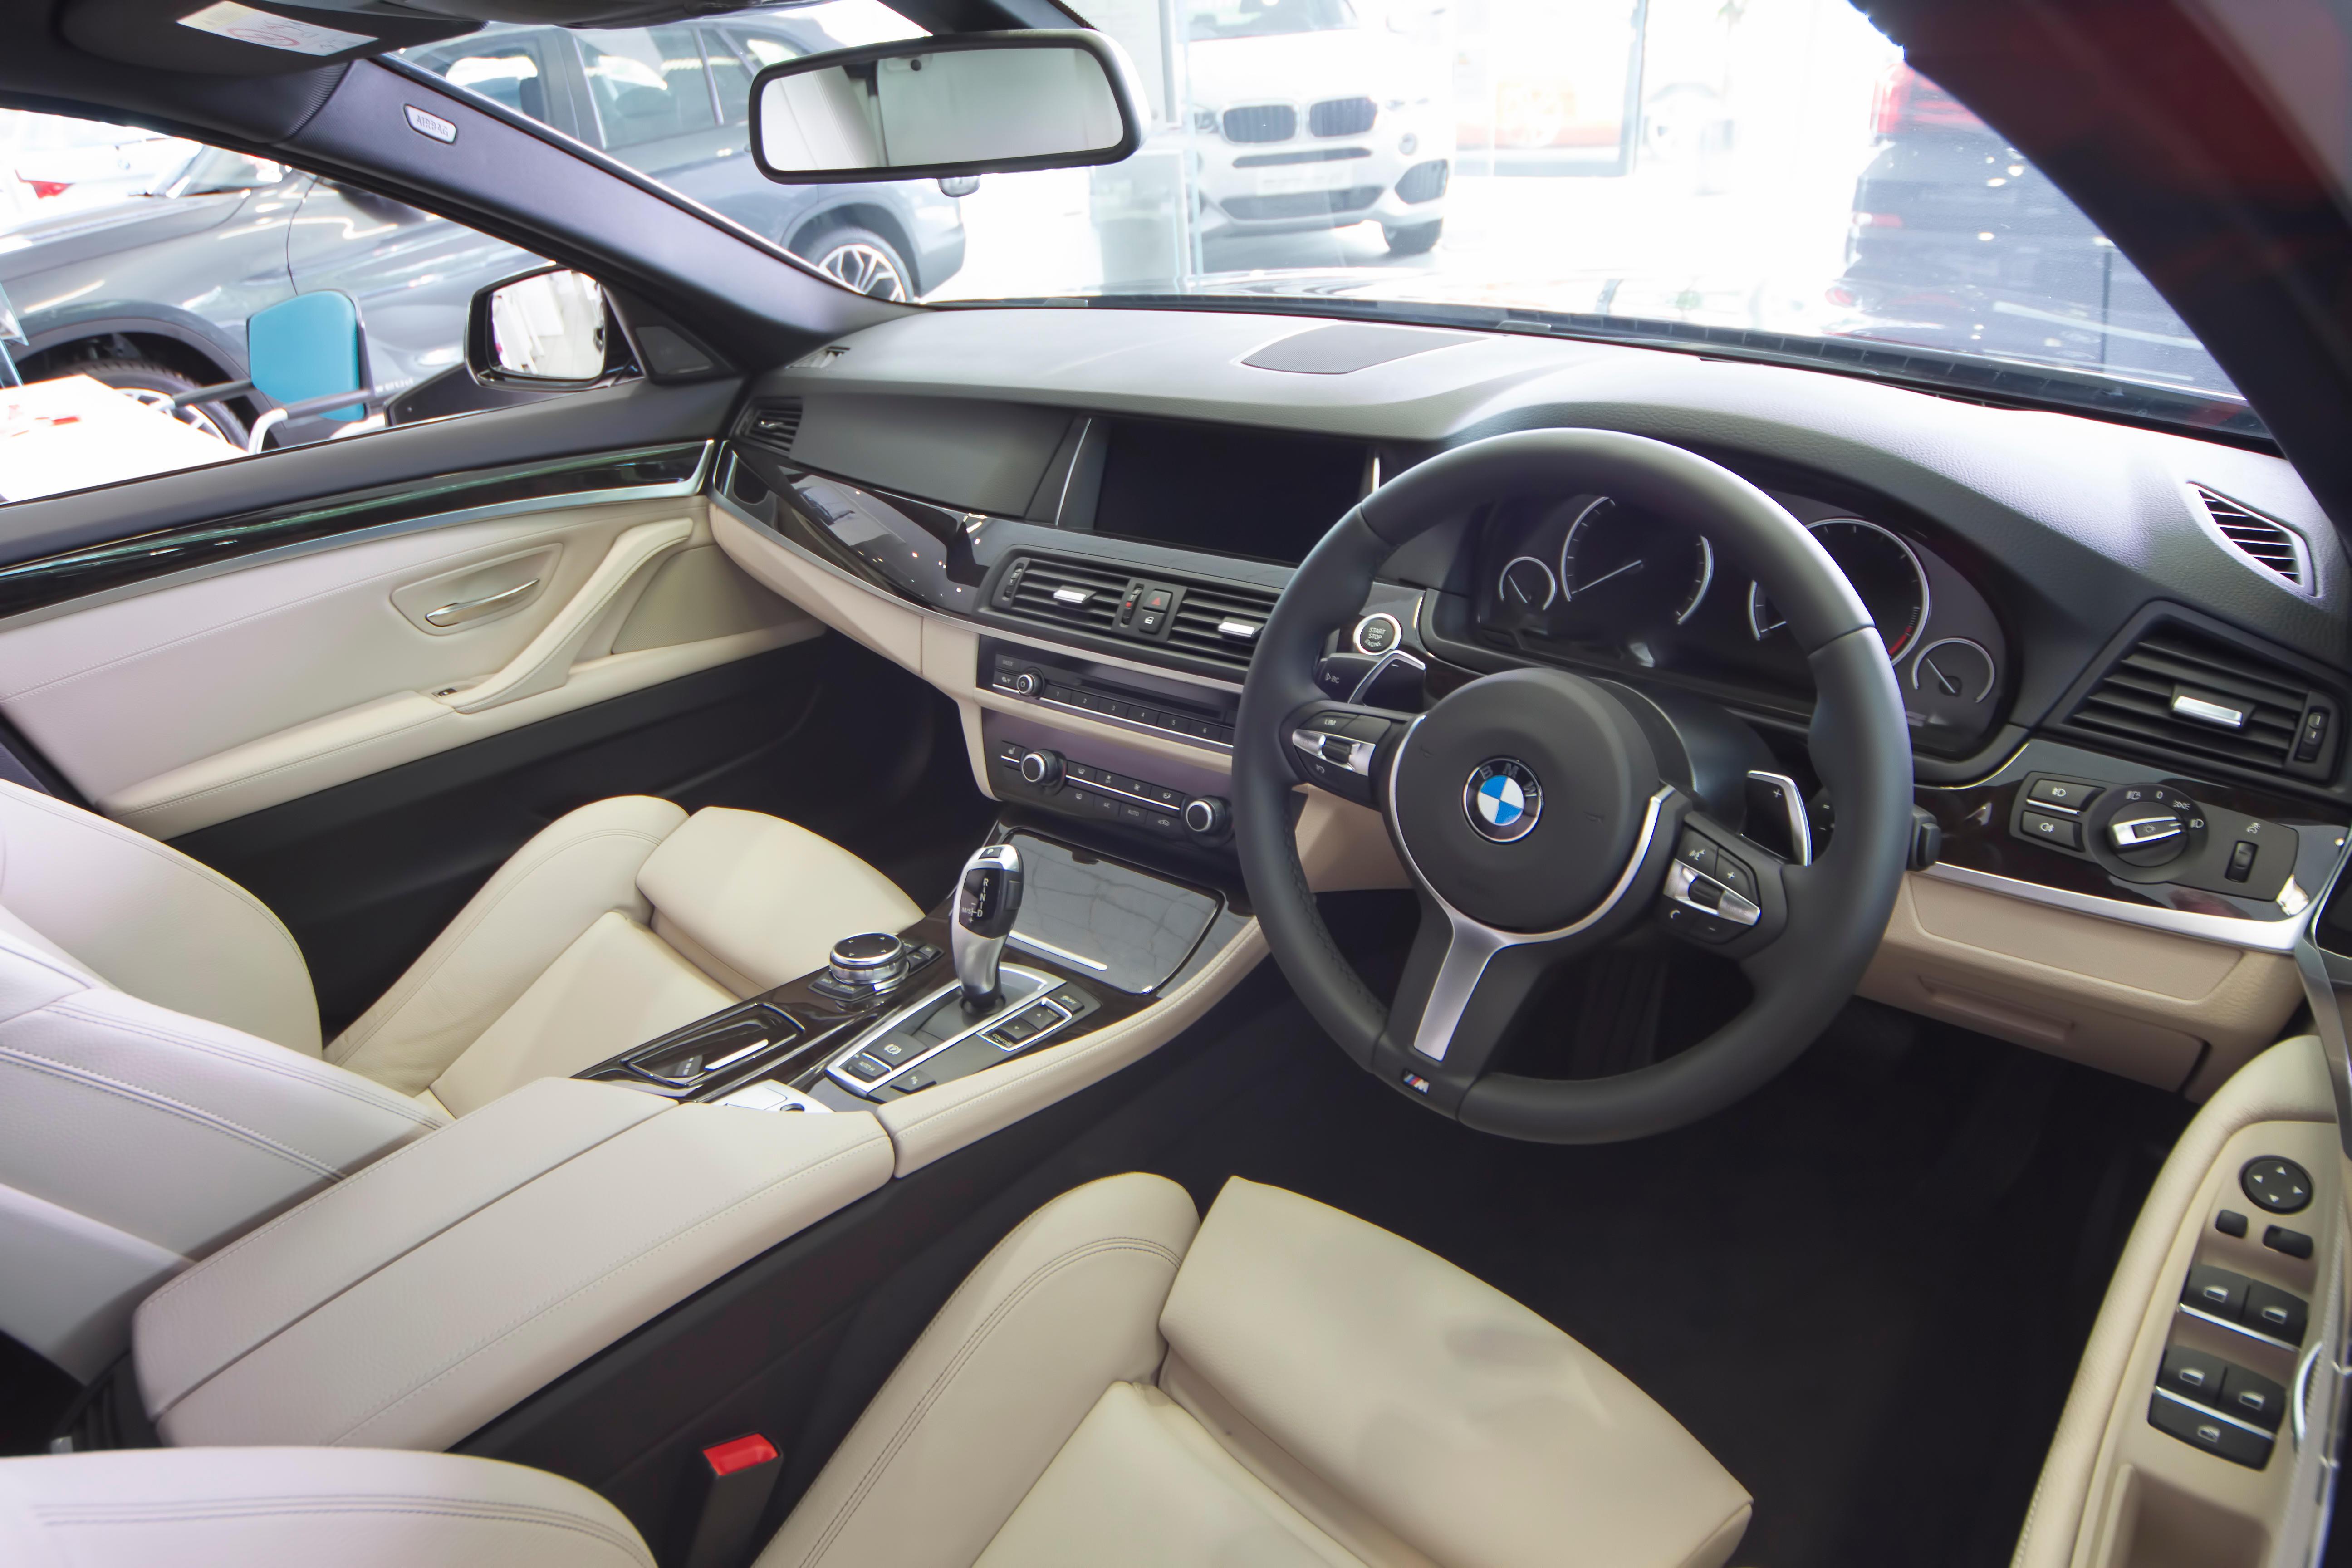 Sytner Solihull BMW Solihull 01217 333444